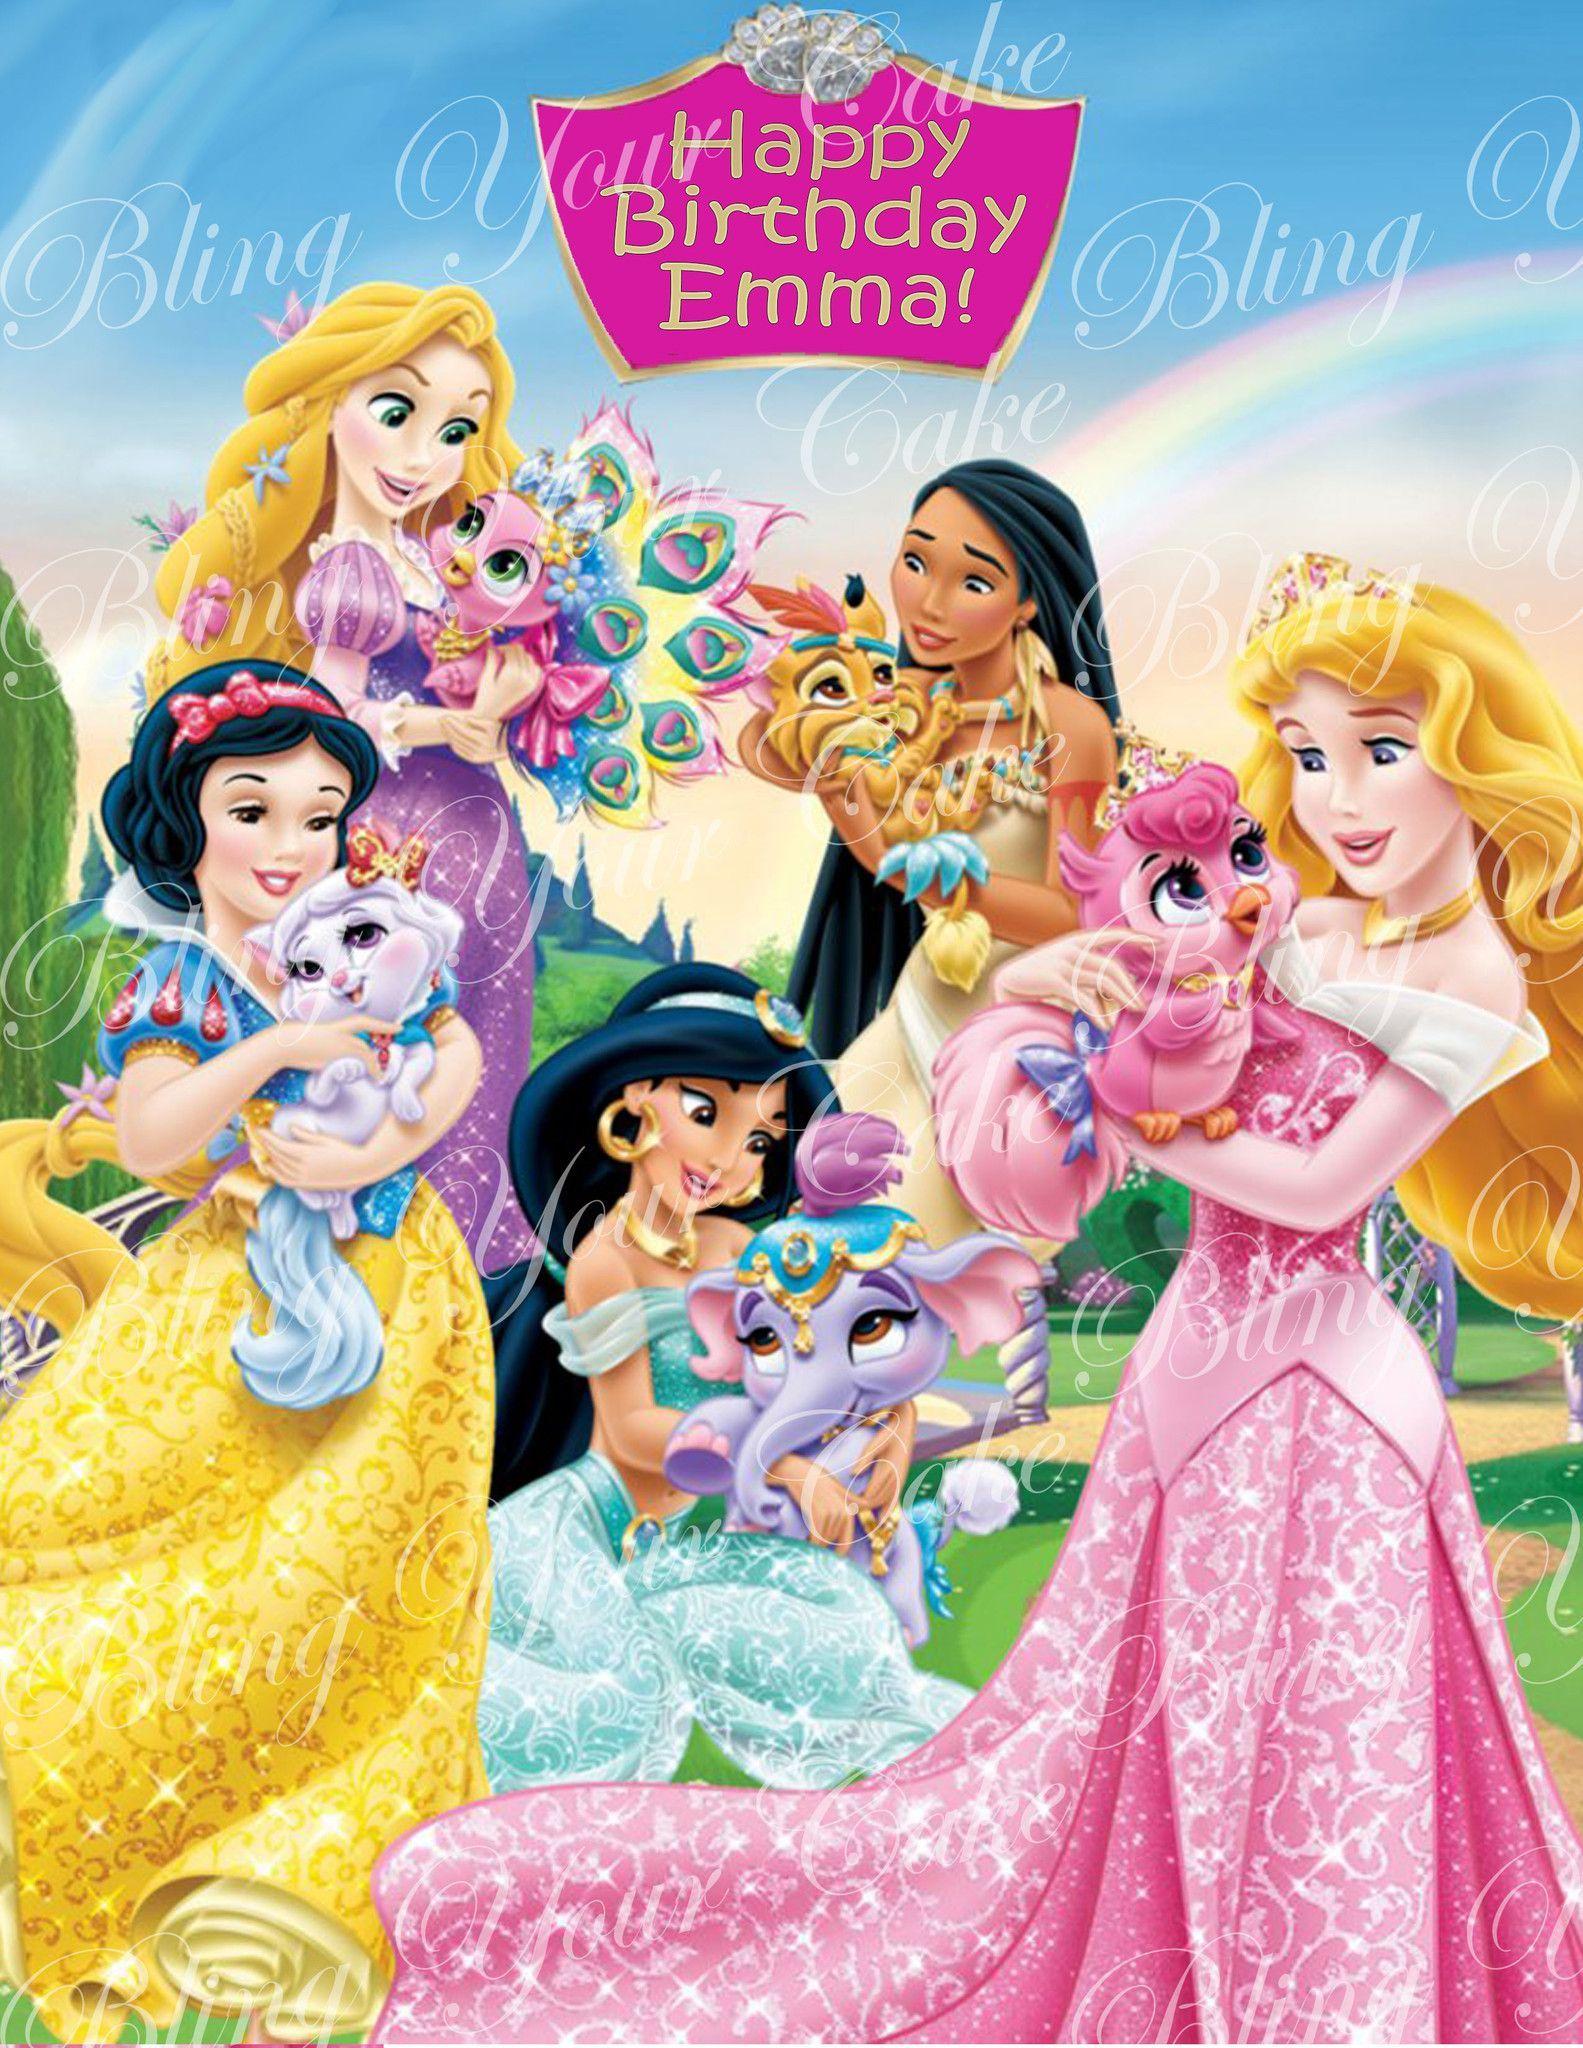 Disney Princess Palace Pets Edible Icing Sheet Cake Decor Topper Dpp2 Princess Palace Pets Disney Princess New Disney Princesses